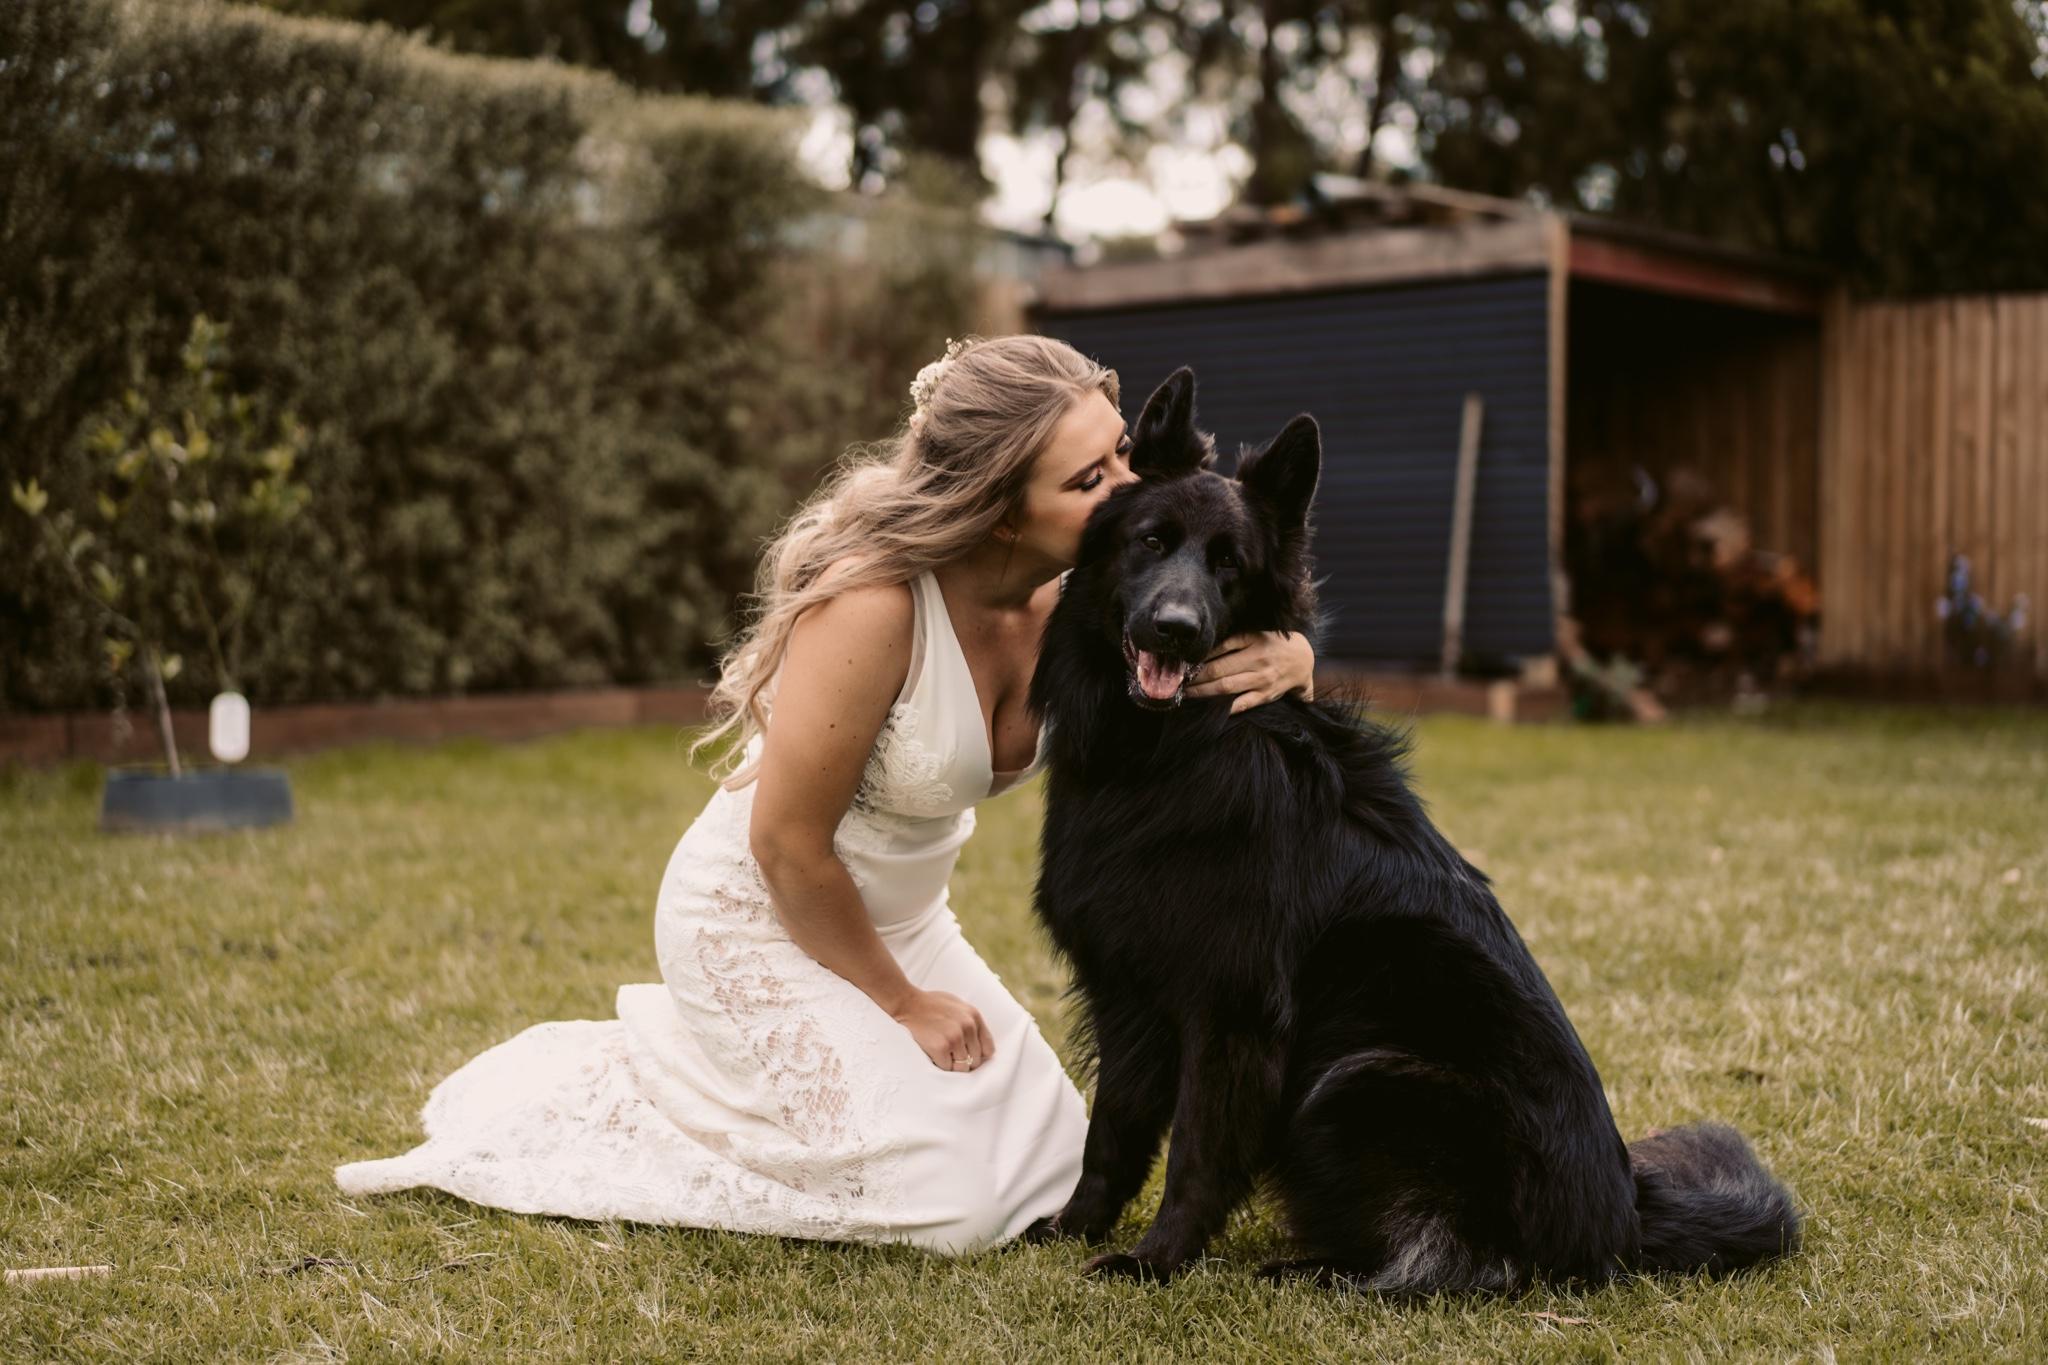 Mornington Peninsula Wedding Photography27.jpg